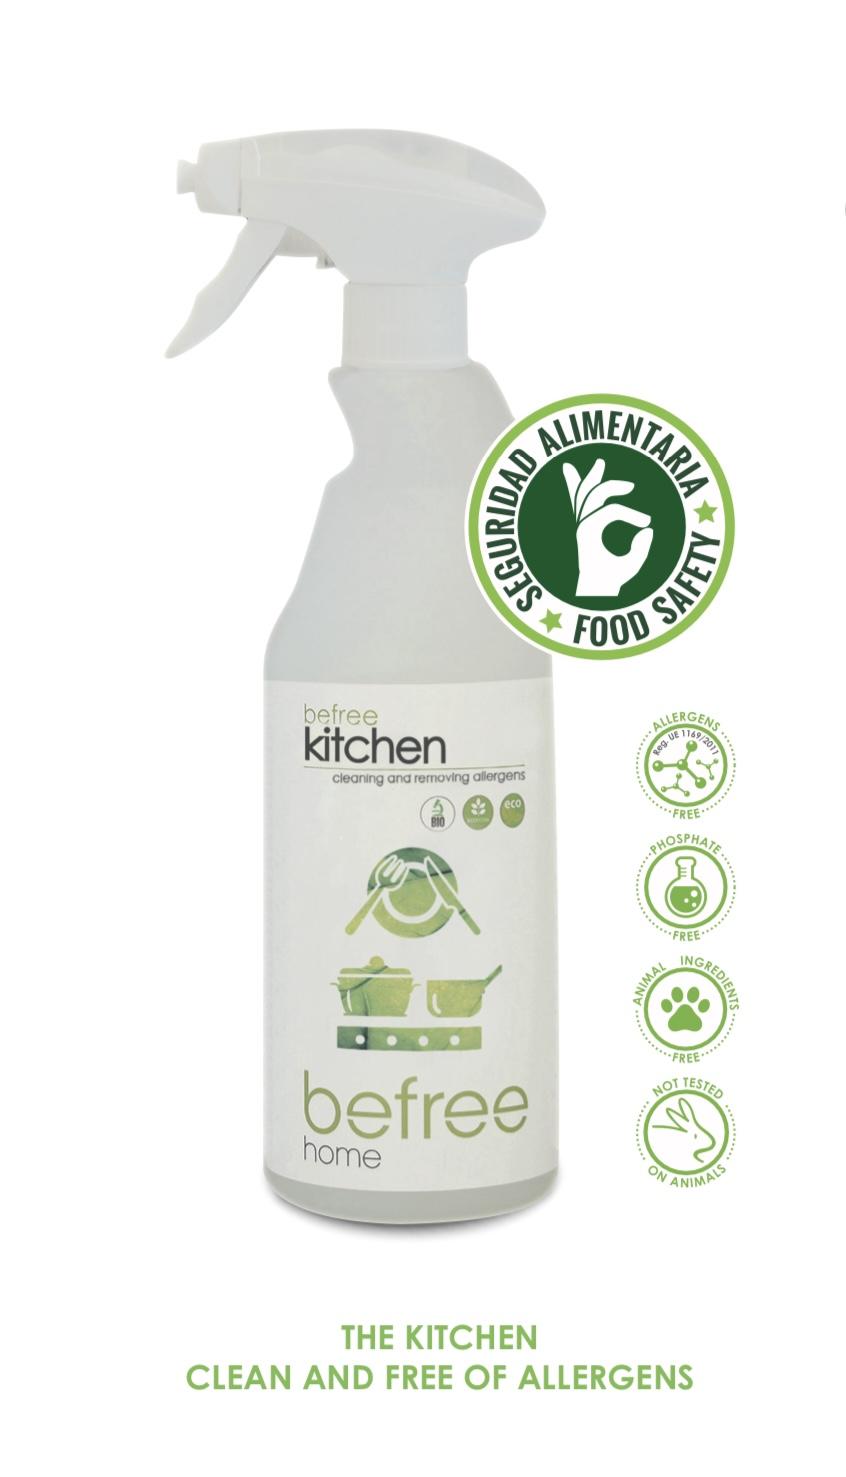 befree kitchen - cleaning and allergen elimination